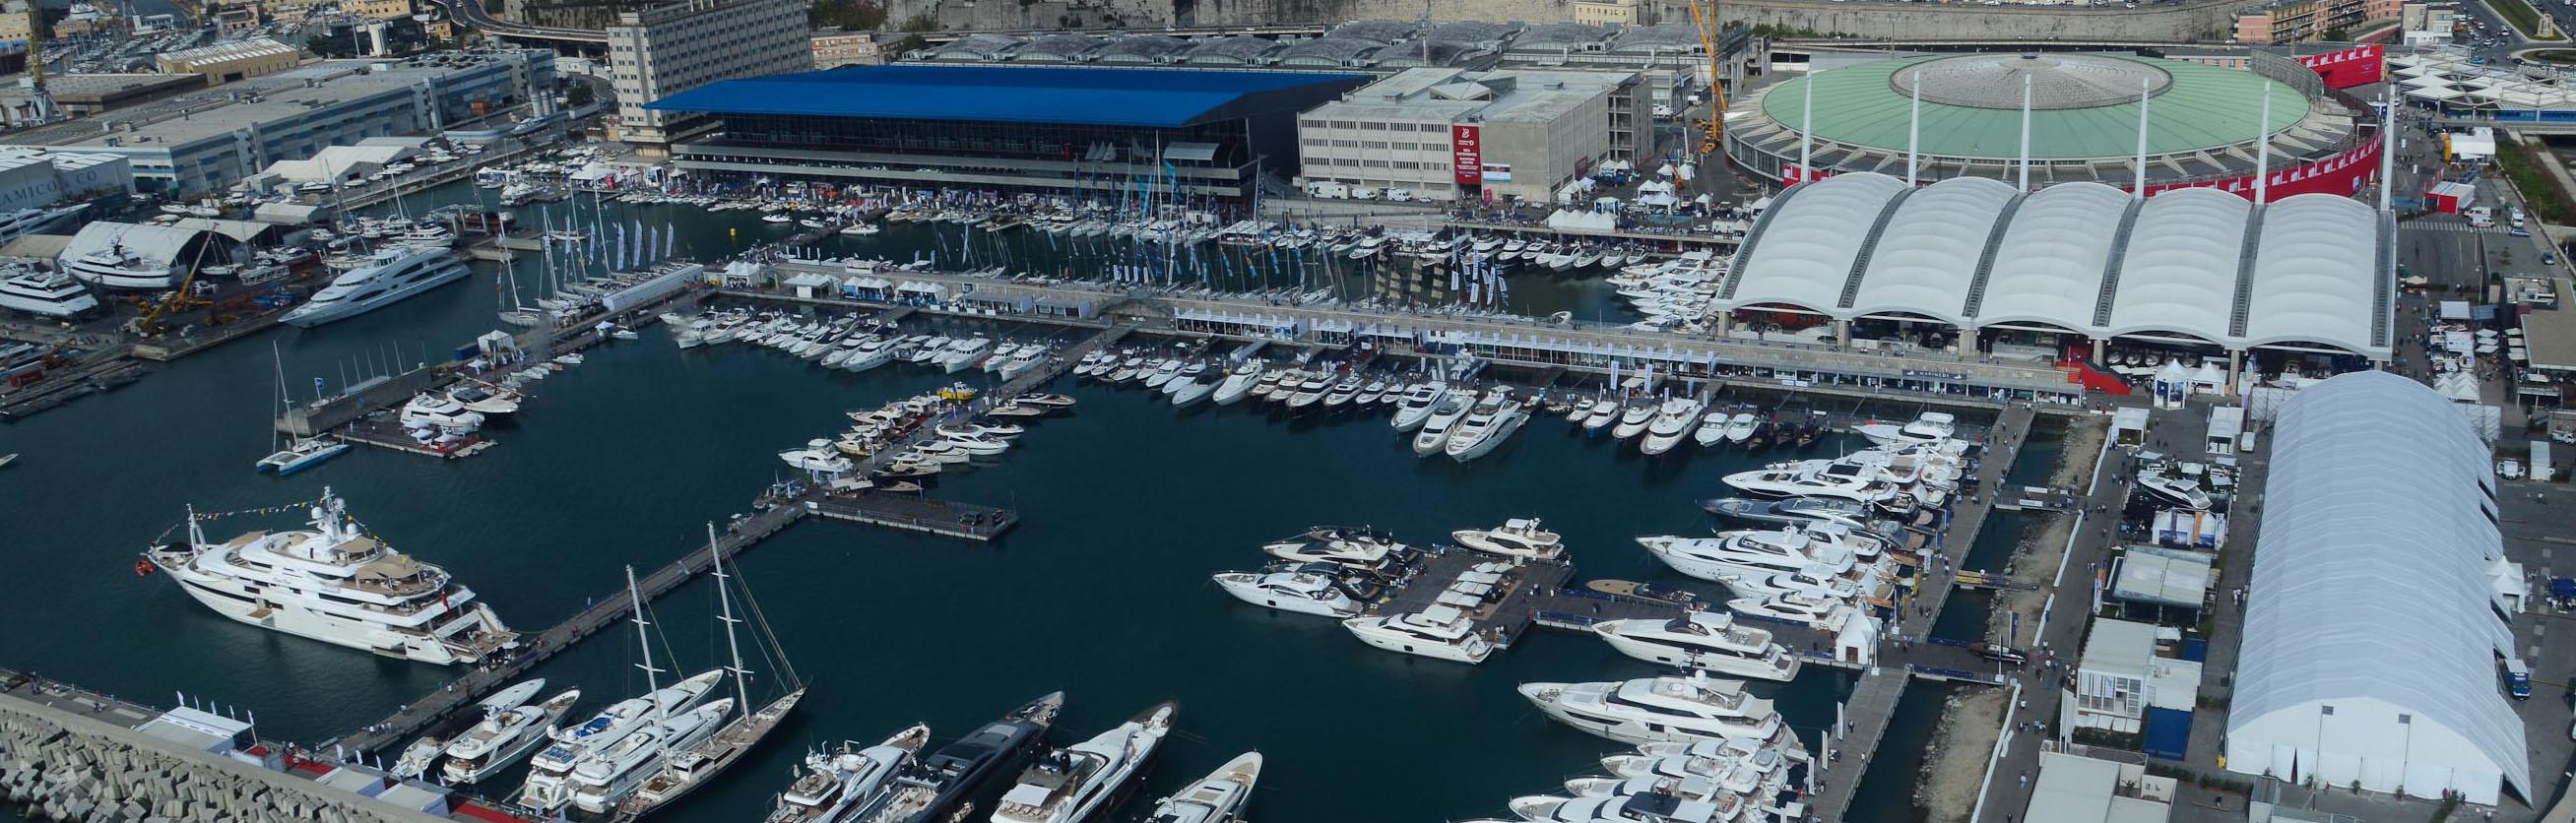 Mochi craft yacht charter superyacht news for Lurssen yacht genova